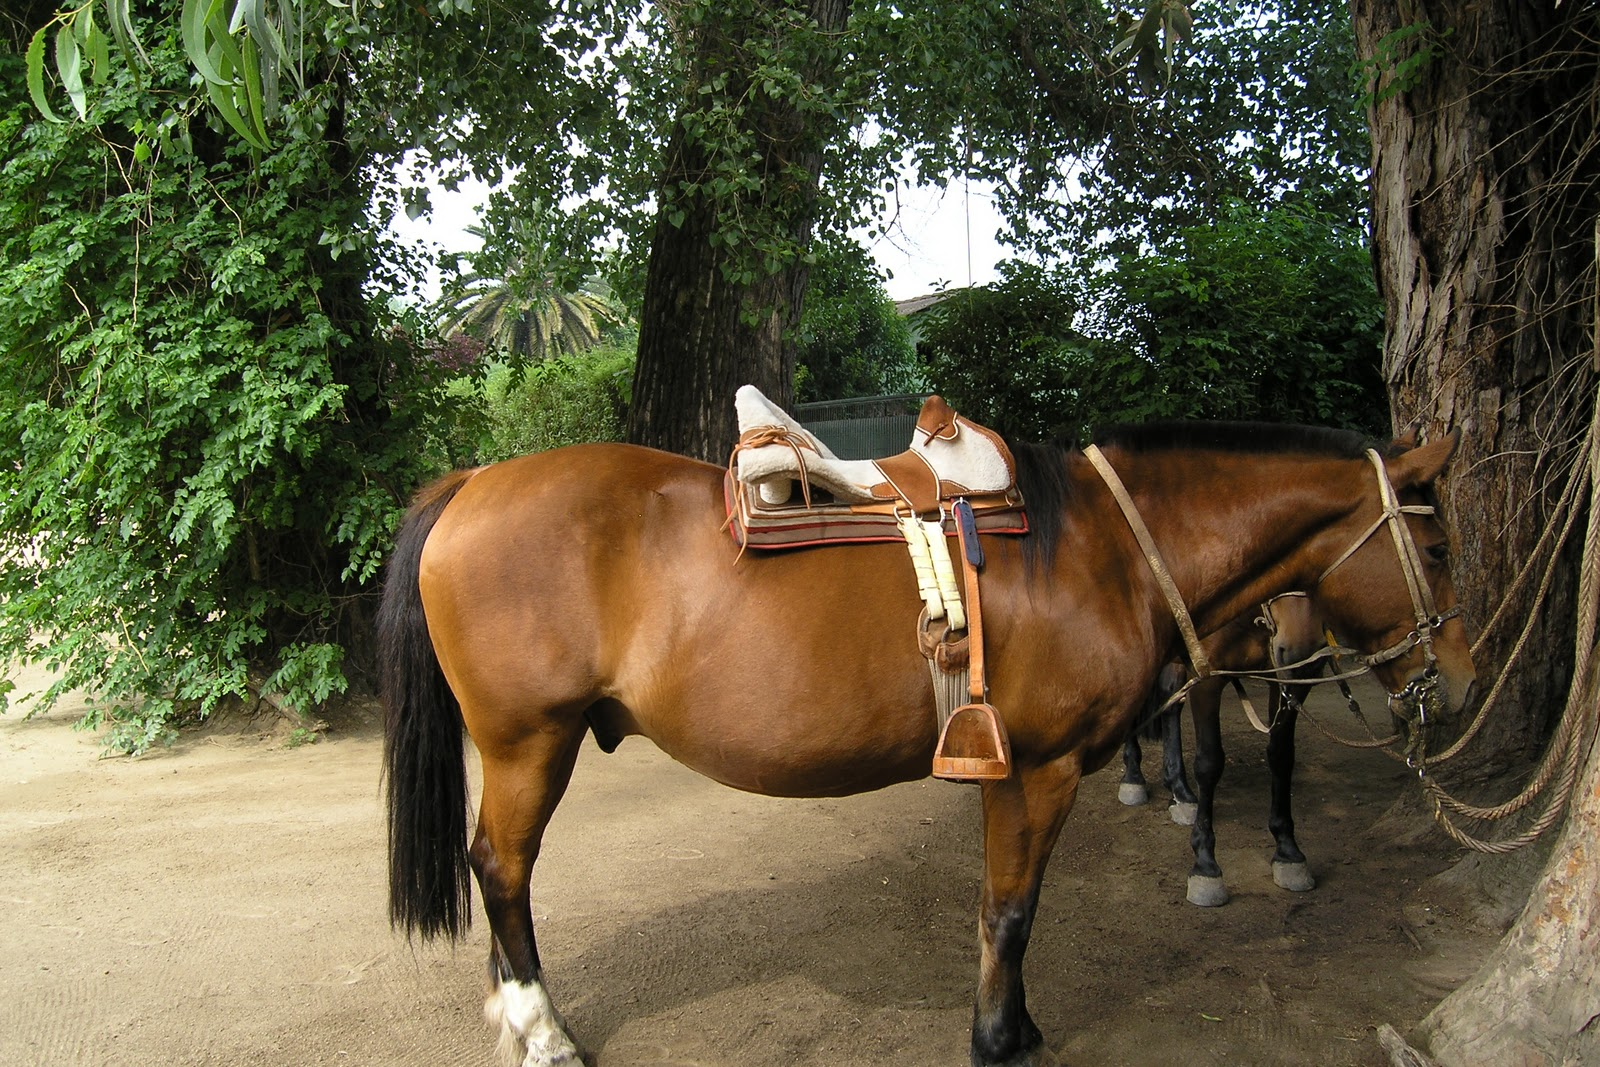 The beautiful horse breed Criollo